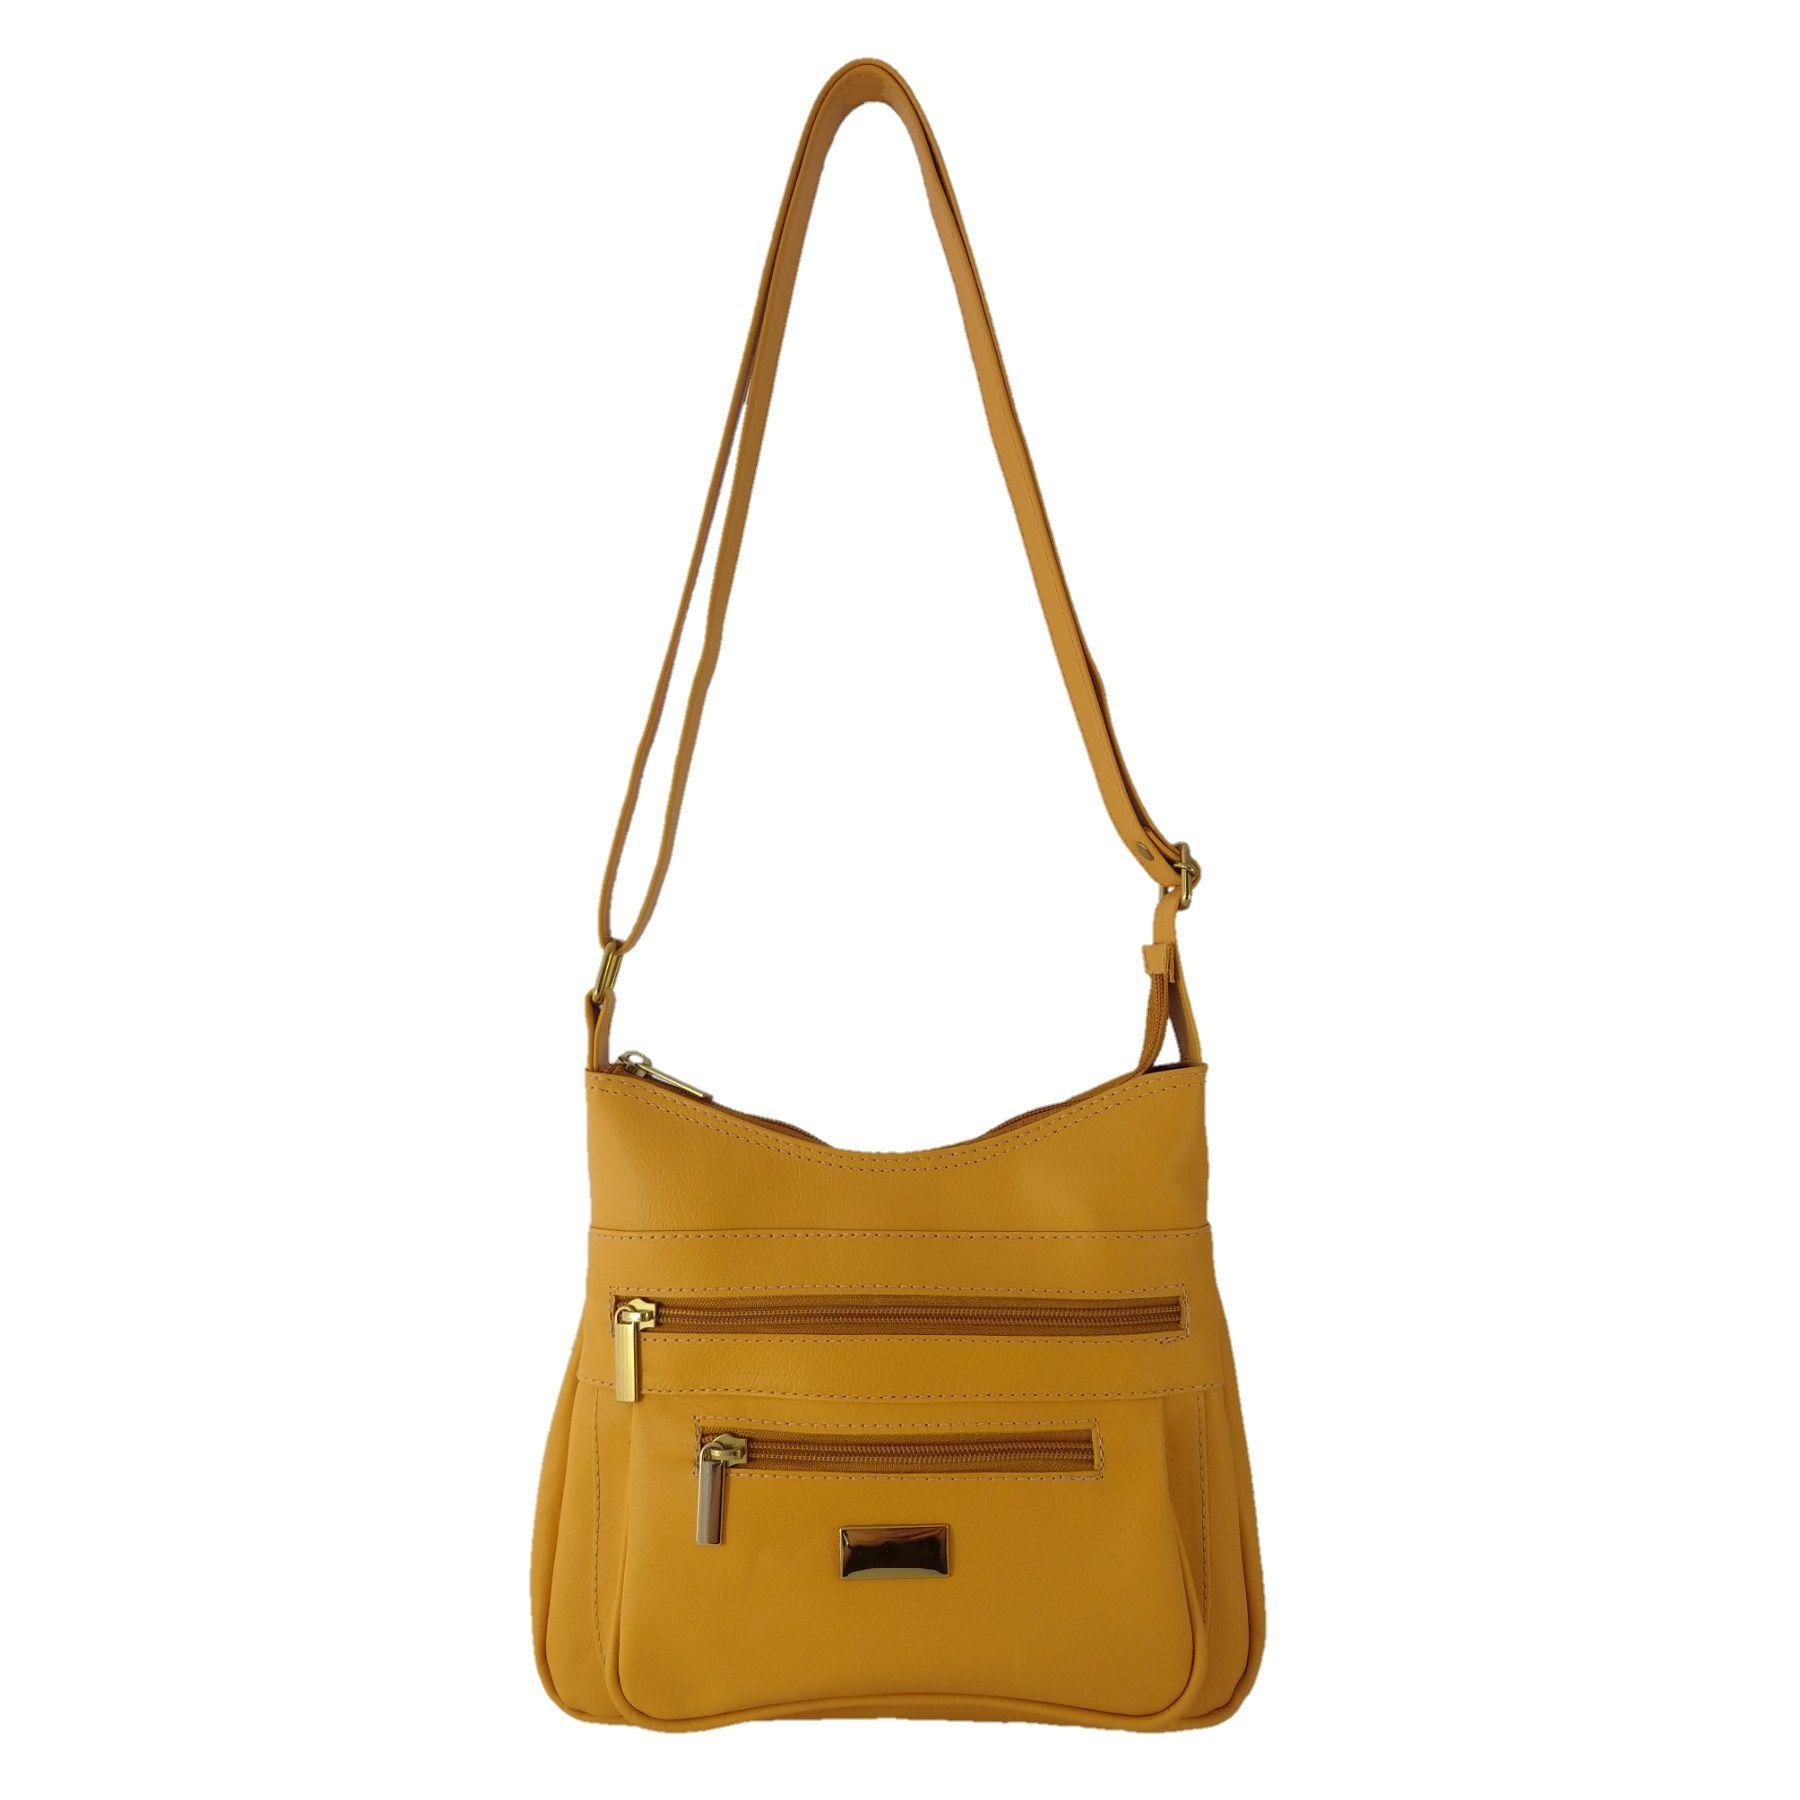 Bolsa Feminina Transversal TopGrife Couro Amarelo  - SAPATOWEB.COM